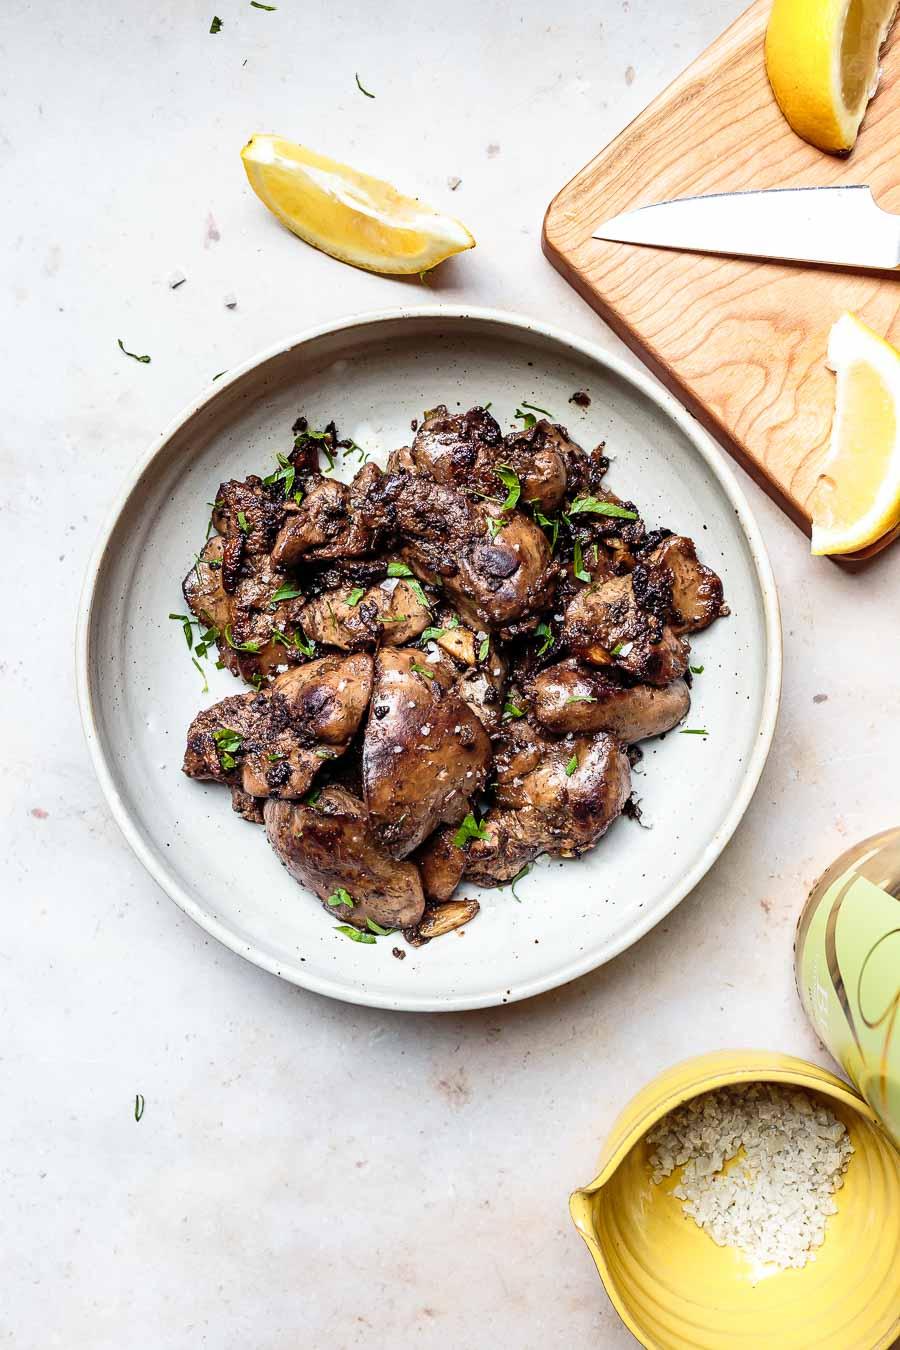 lemon garlic chicken liver with fresh parsley and lemon wedges